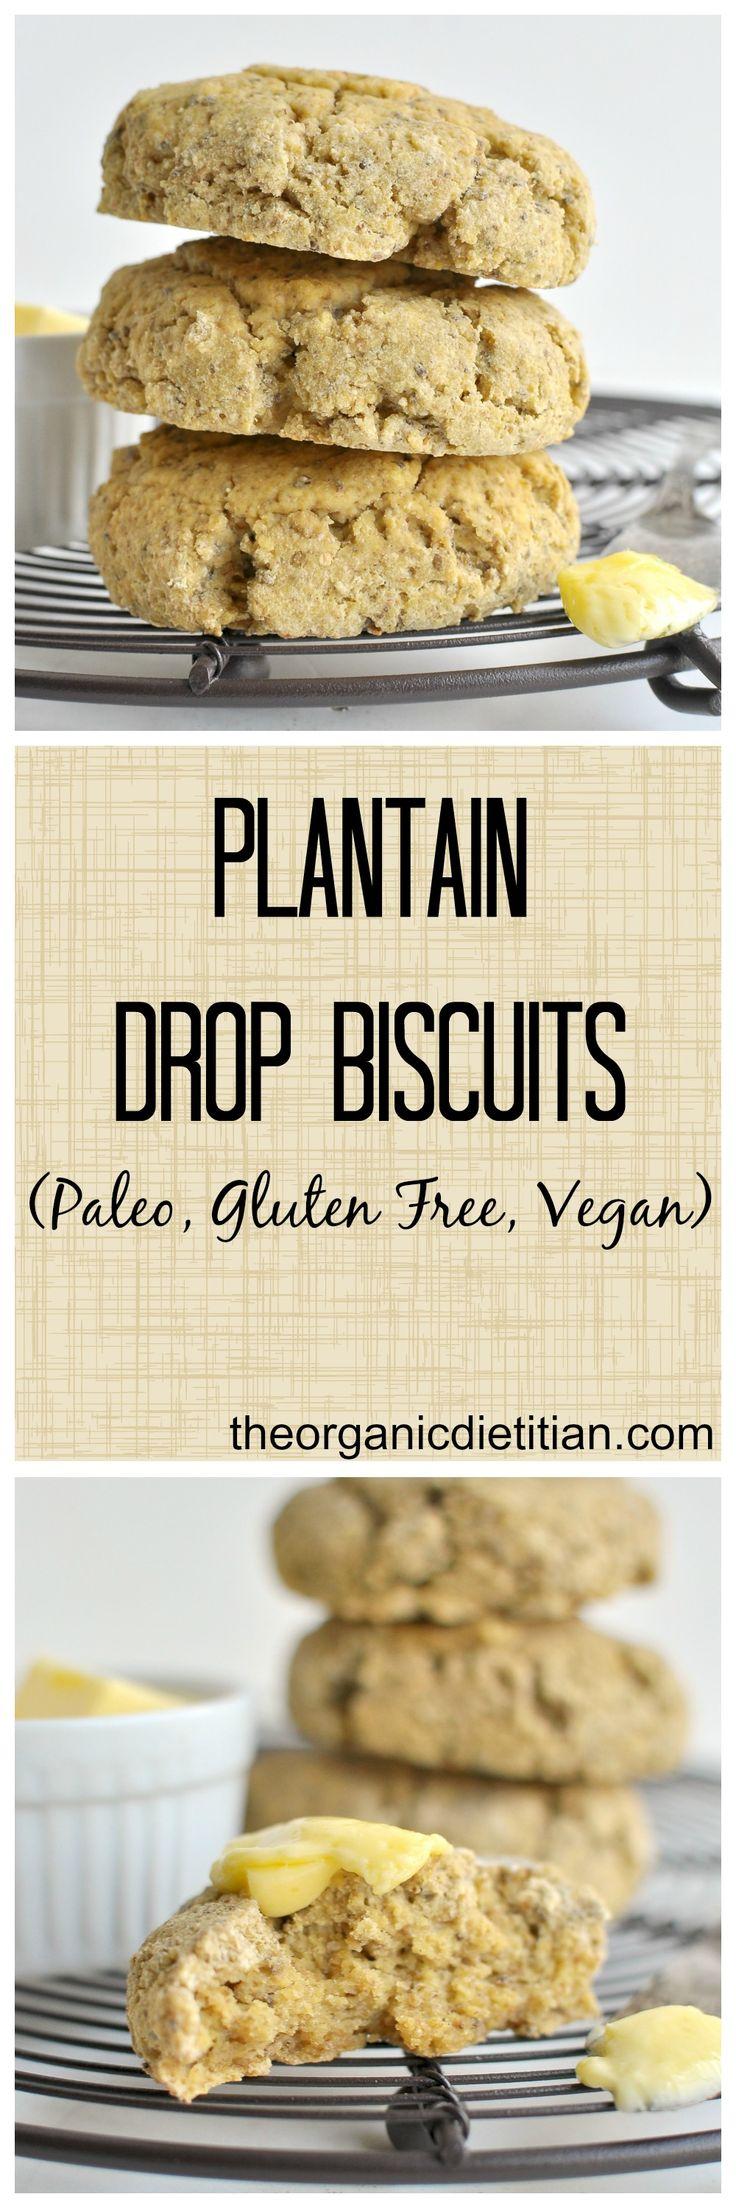 Vegan Plantain Drop Biscuits Recipe